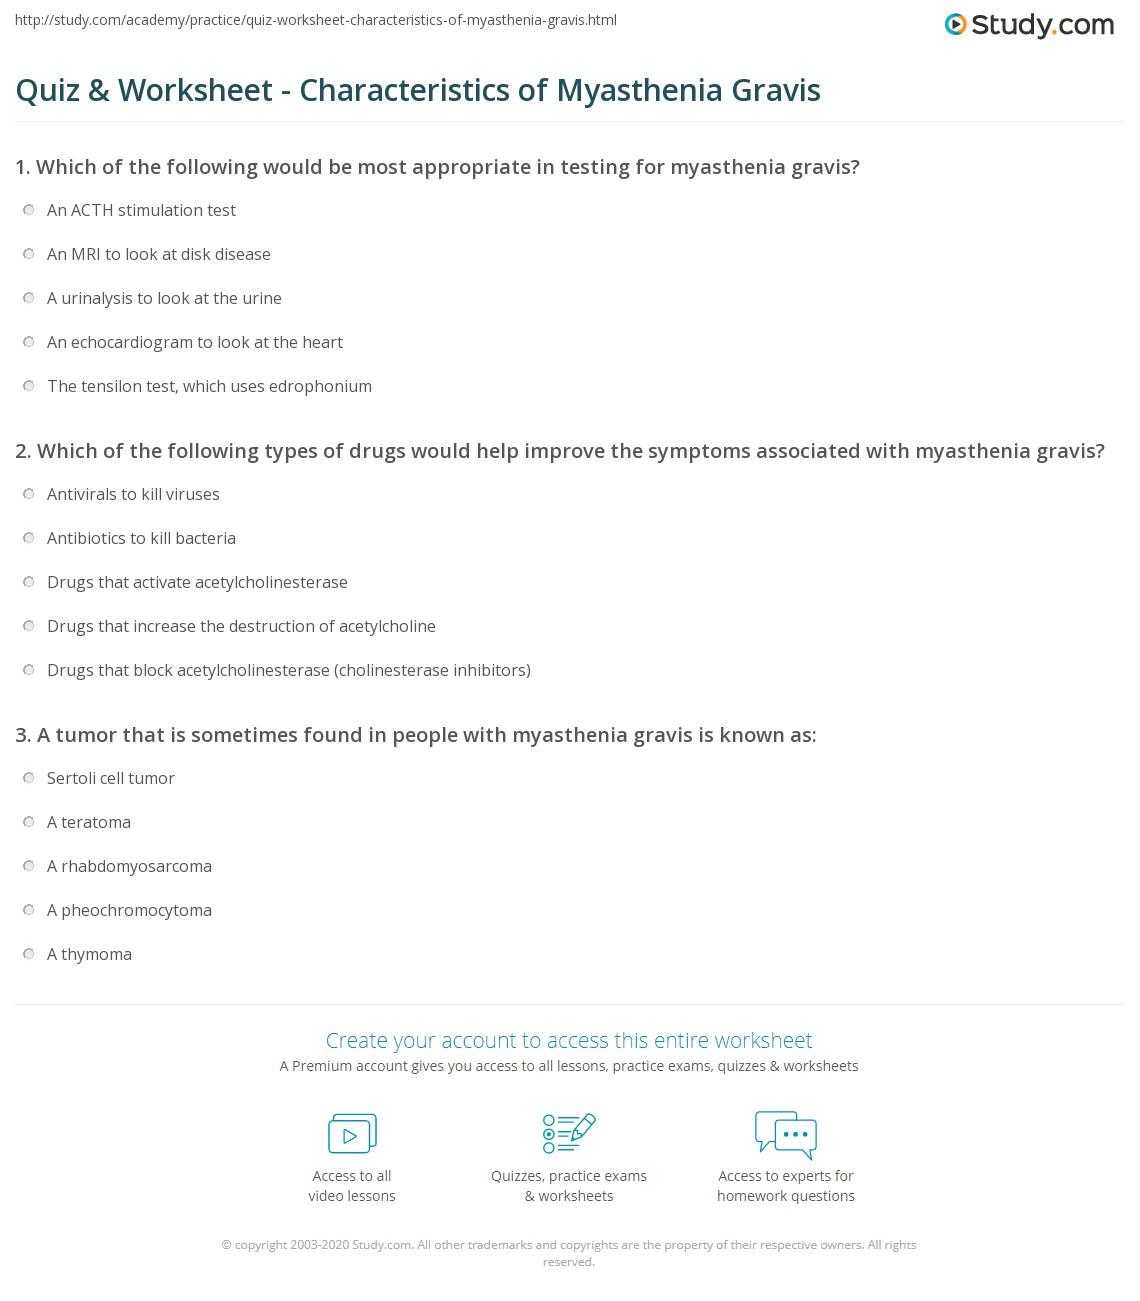 Quiz & Worksheet - Characteristics of Myasthenia Gravis | Study.com